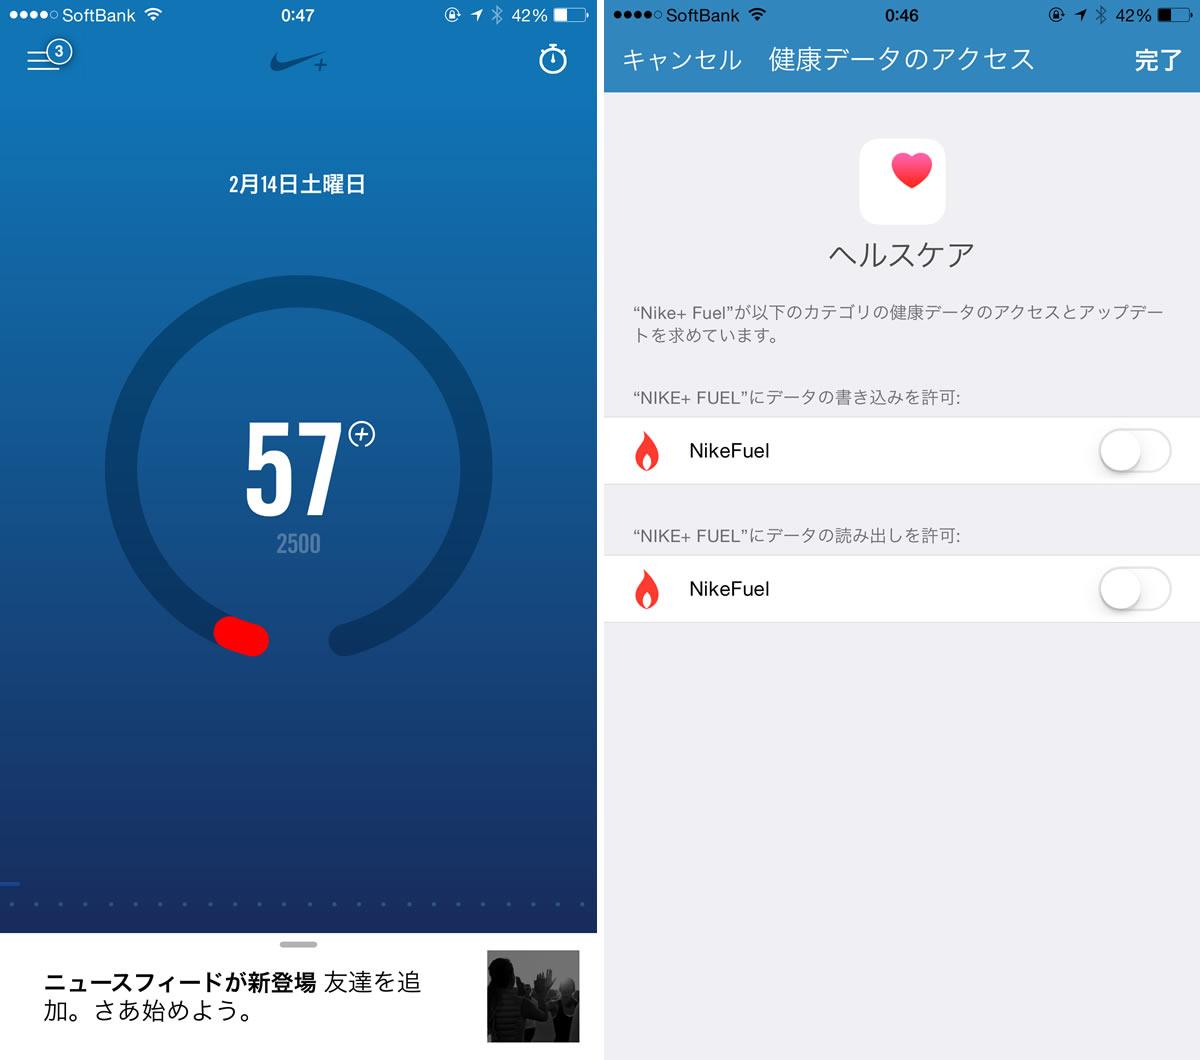 Nike、「Nike+ FuelBand」のiOS向け公式アプリをアップデート − 「ヘルスケア」アプリを利用してNikeFuelを獲得可能に